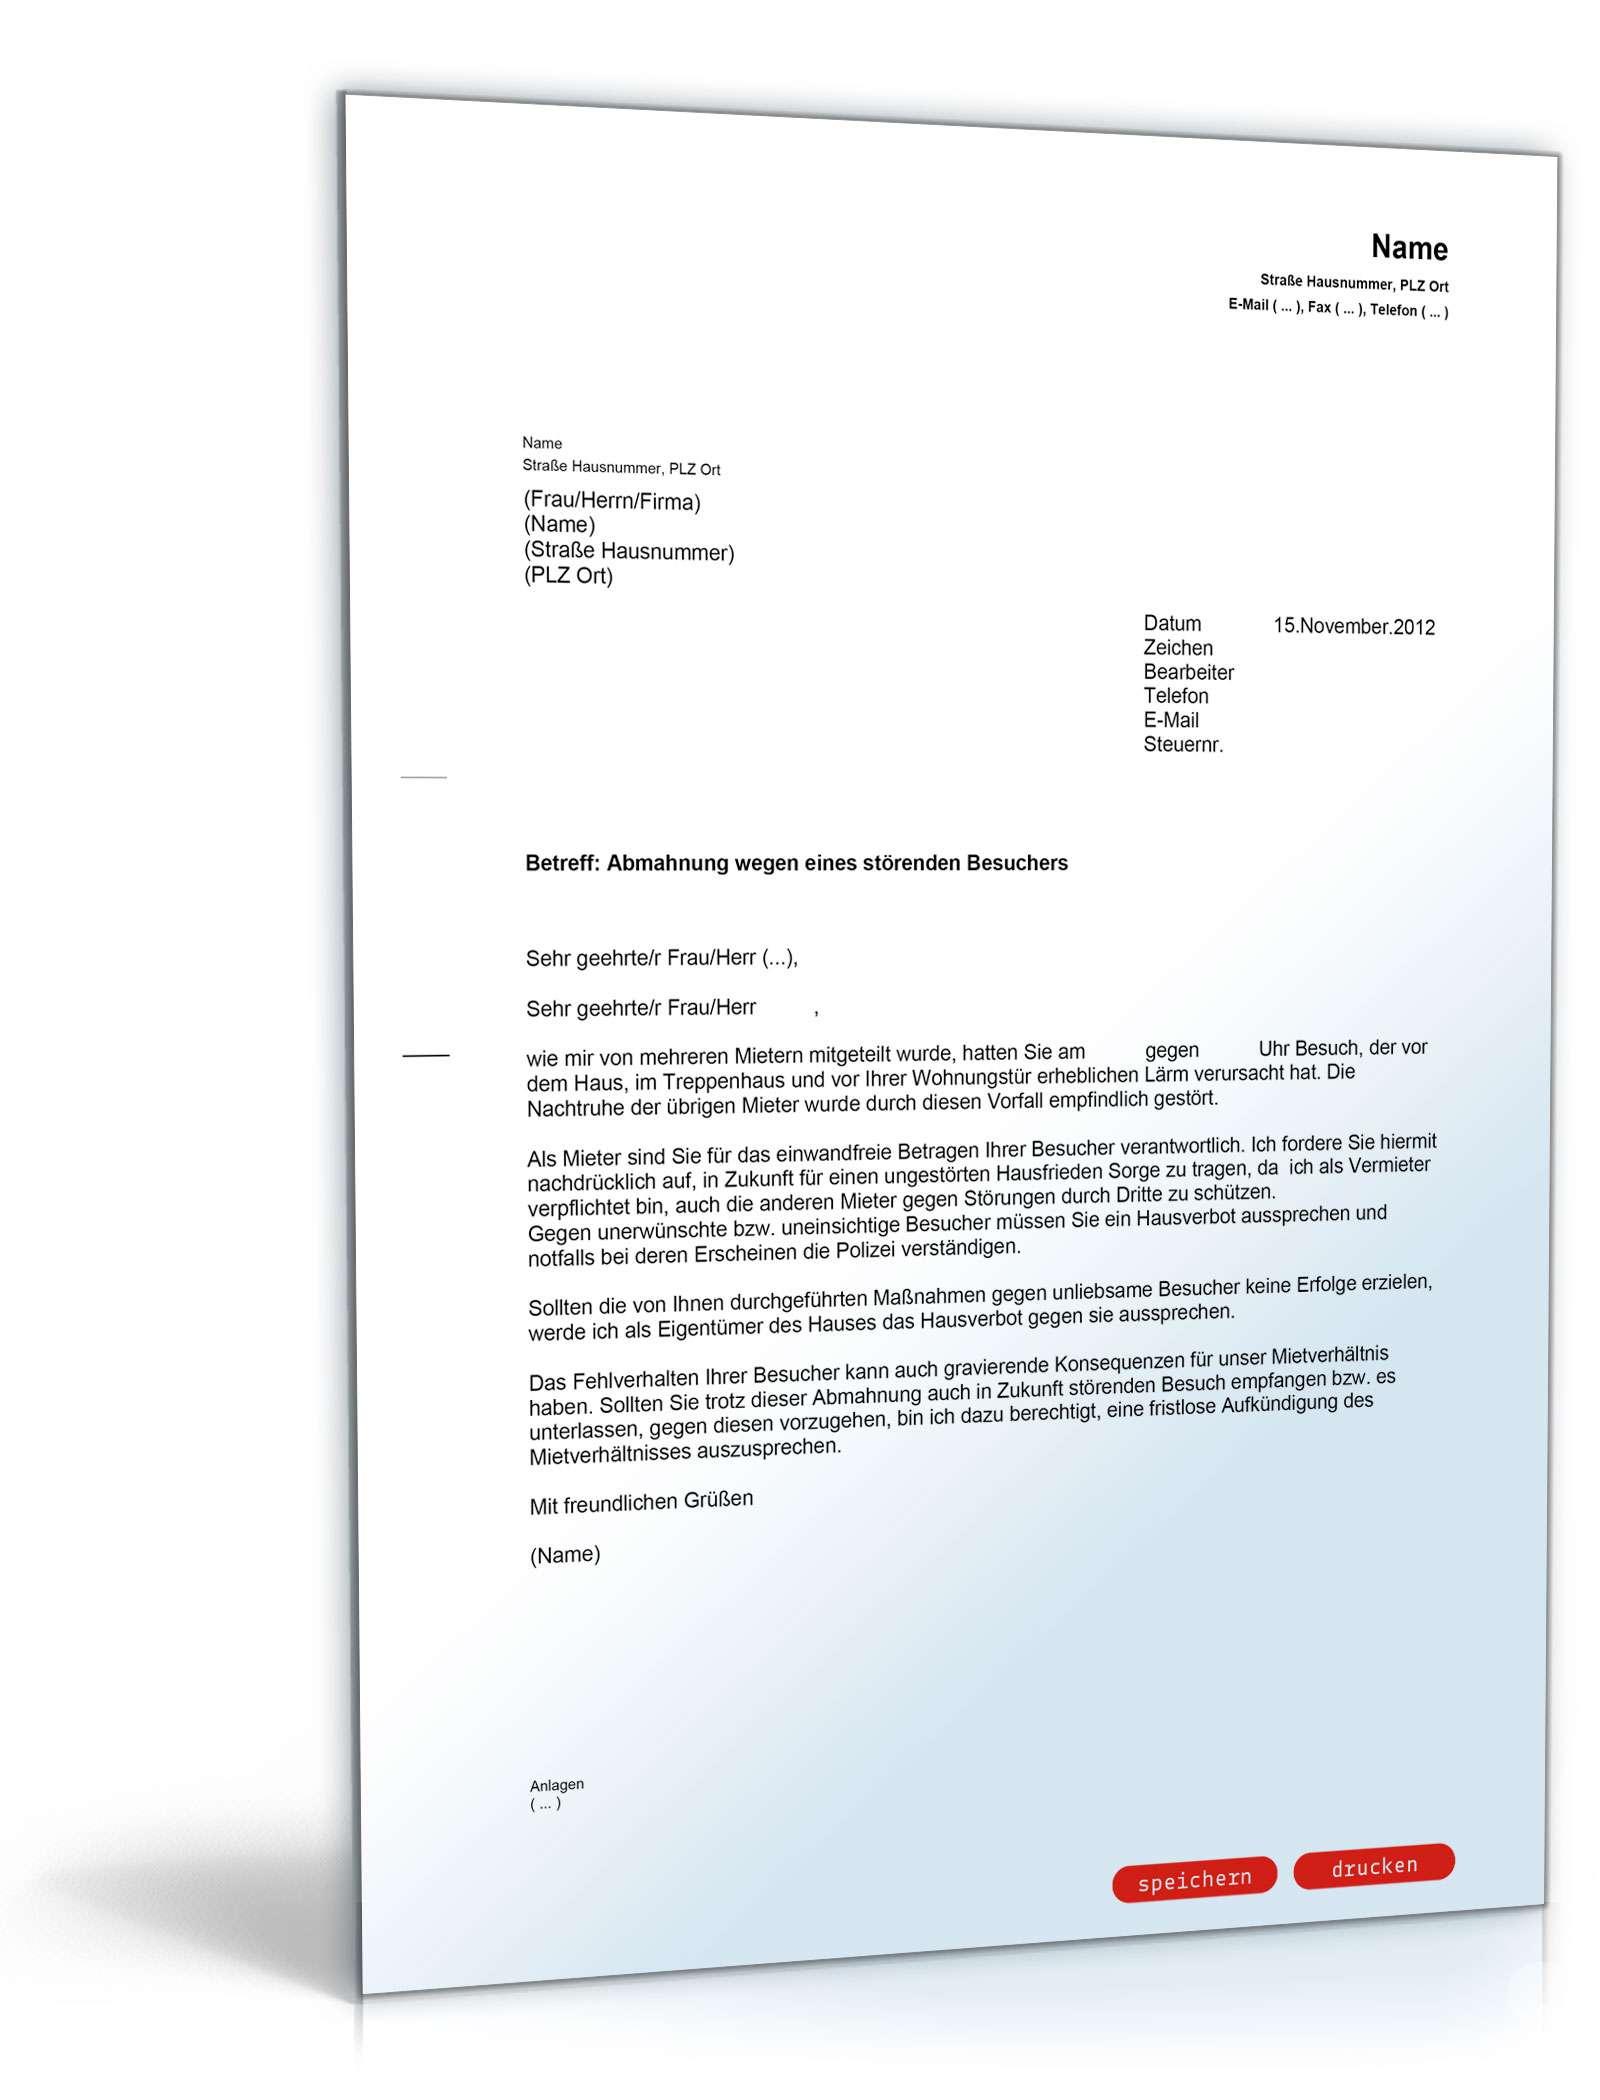 omsembirthkfac: Hausverbot musterbrief